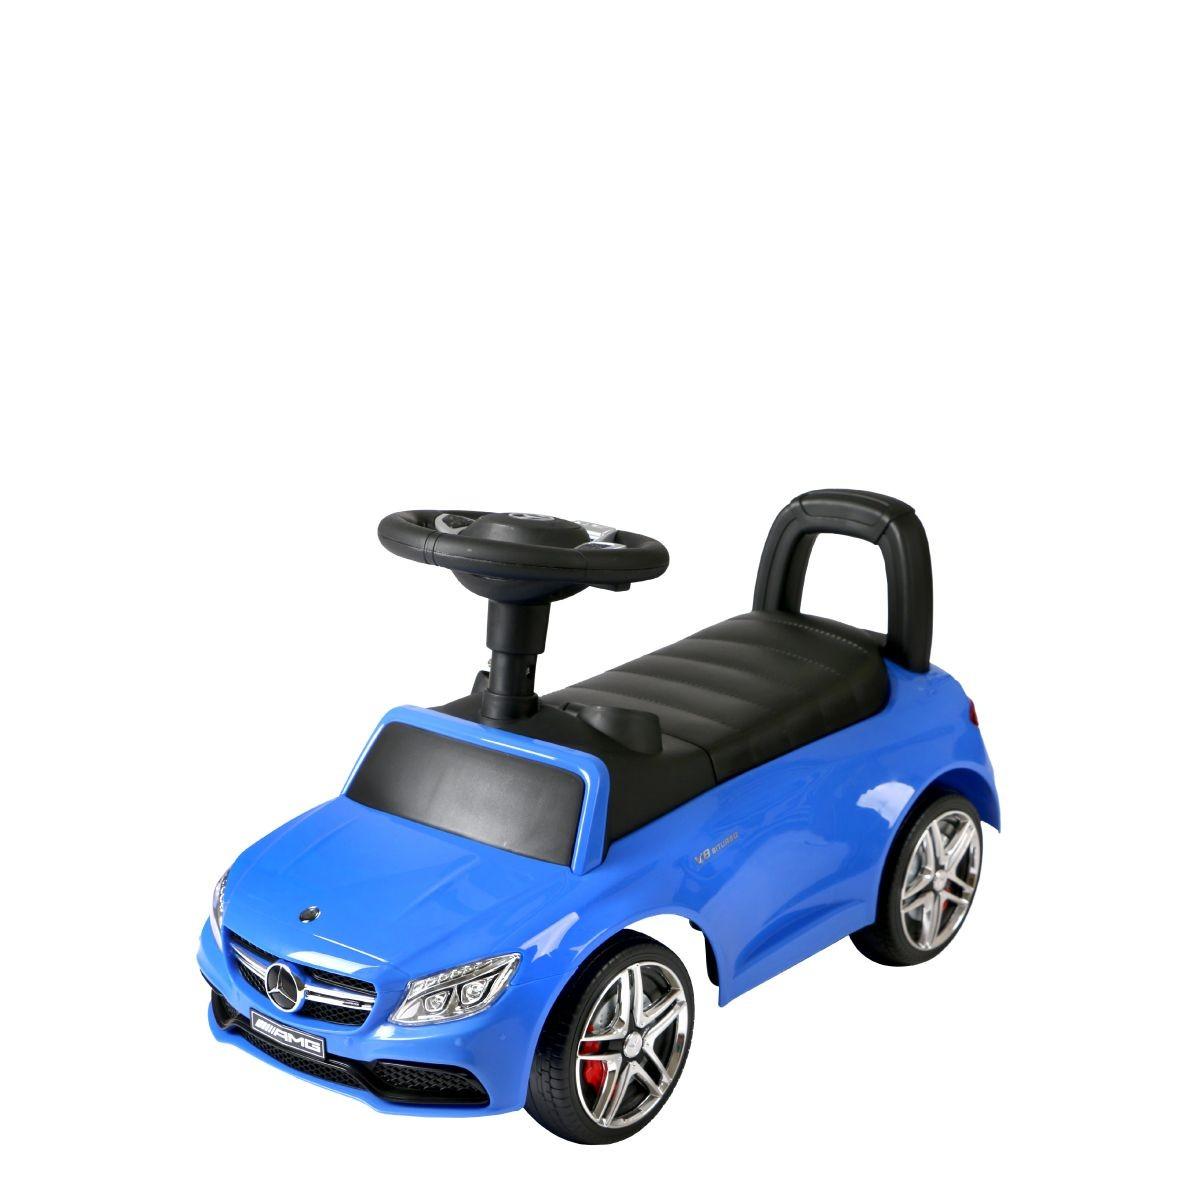 Mb Ride On Car - Kico Baby Center